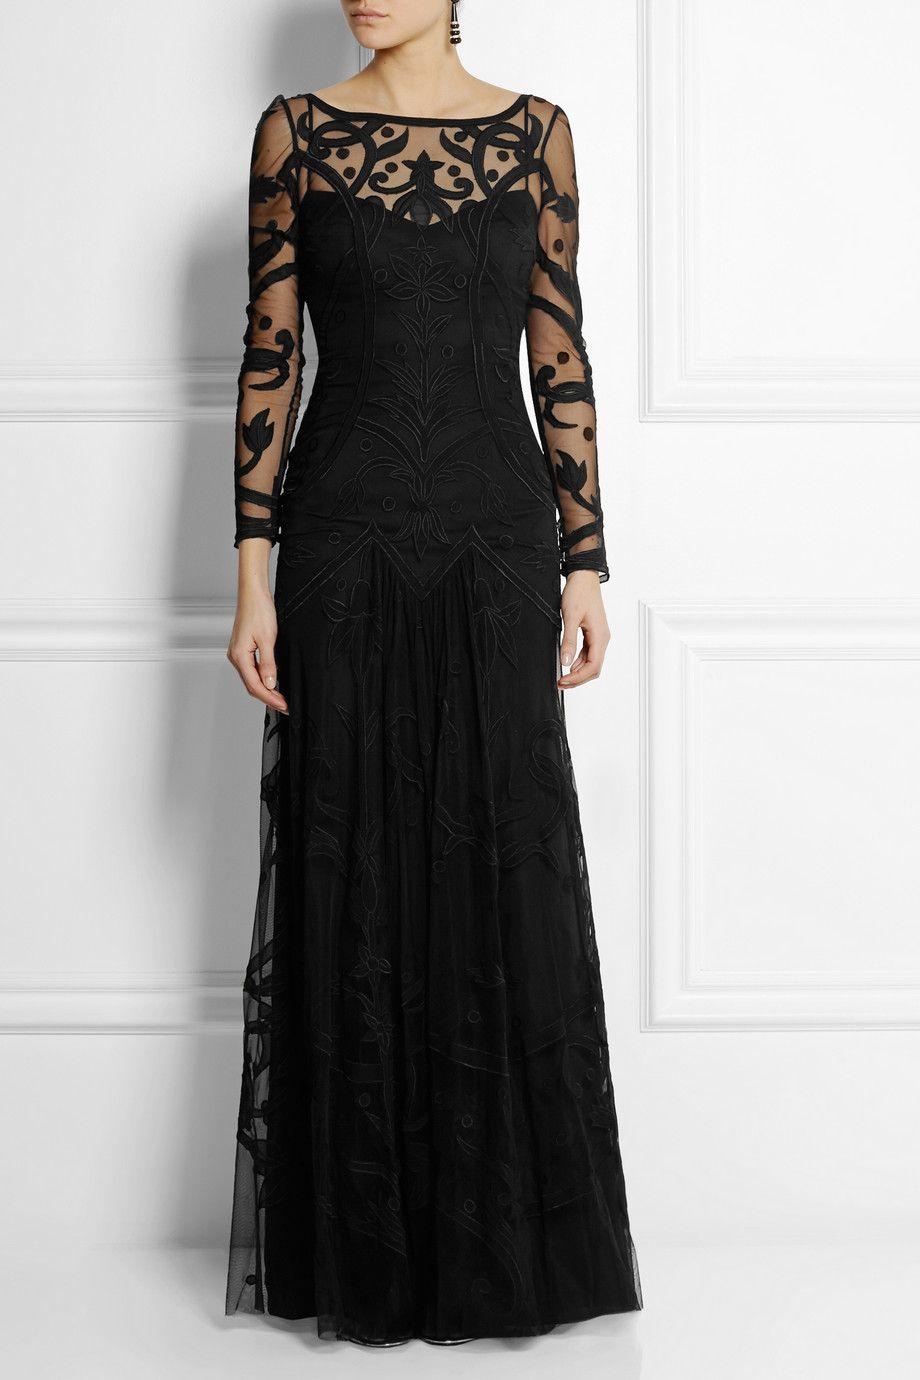 Temperley London   Modă   Pinterest   Temperley, Designer gowns and ...